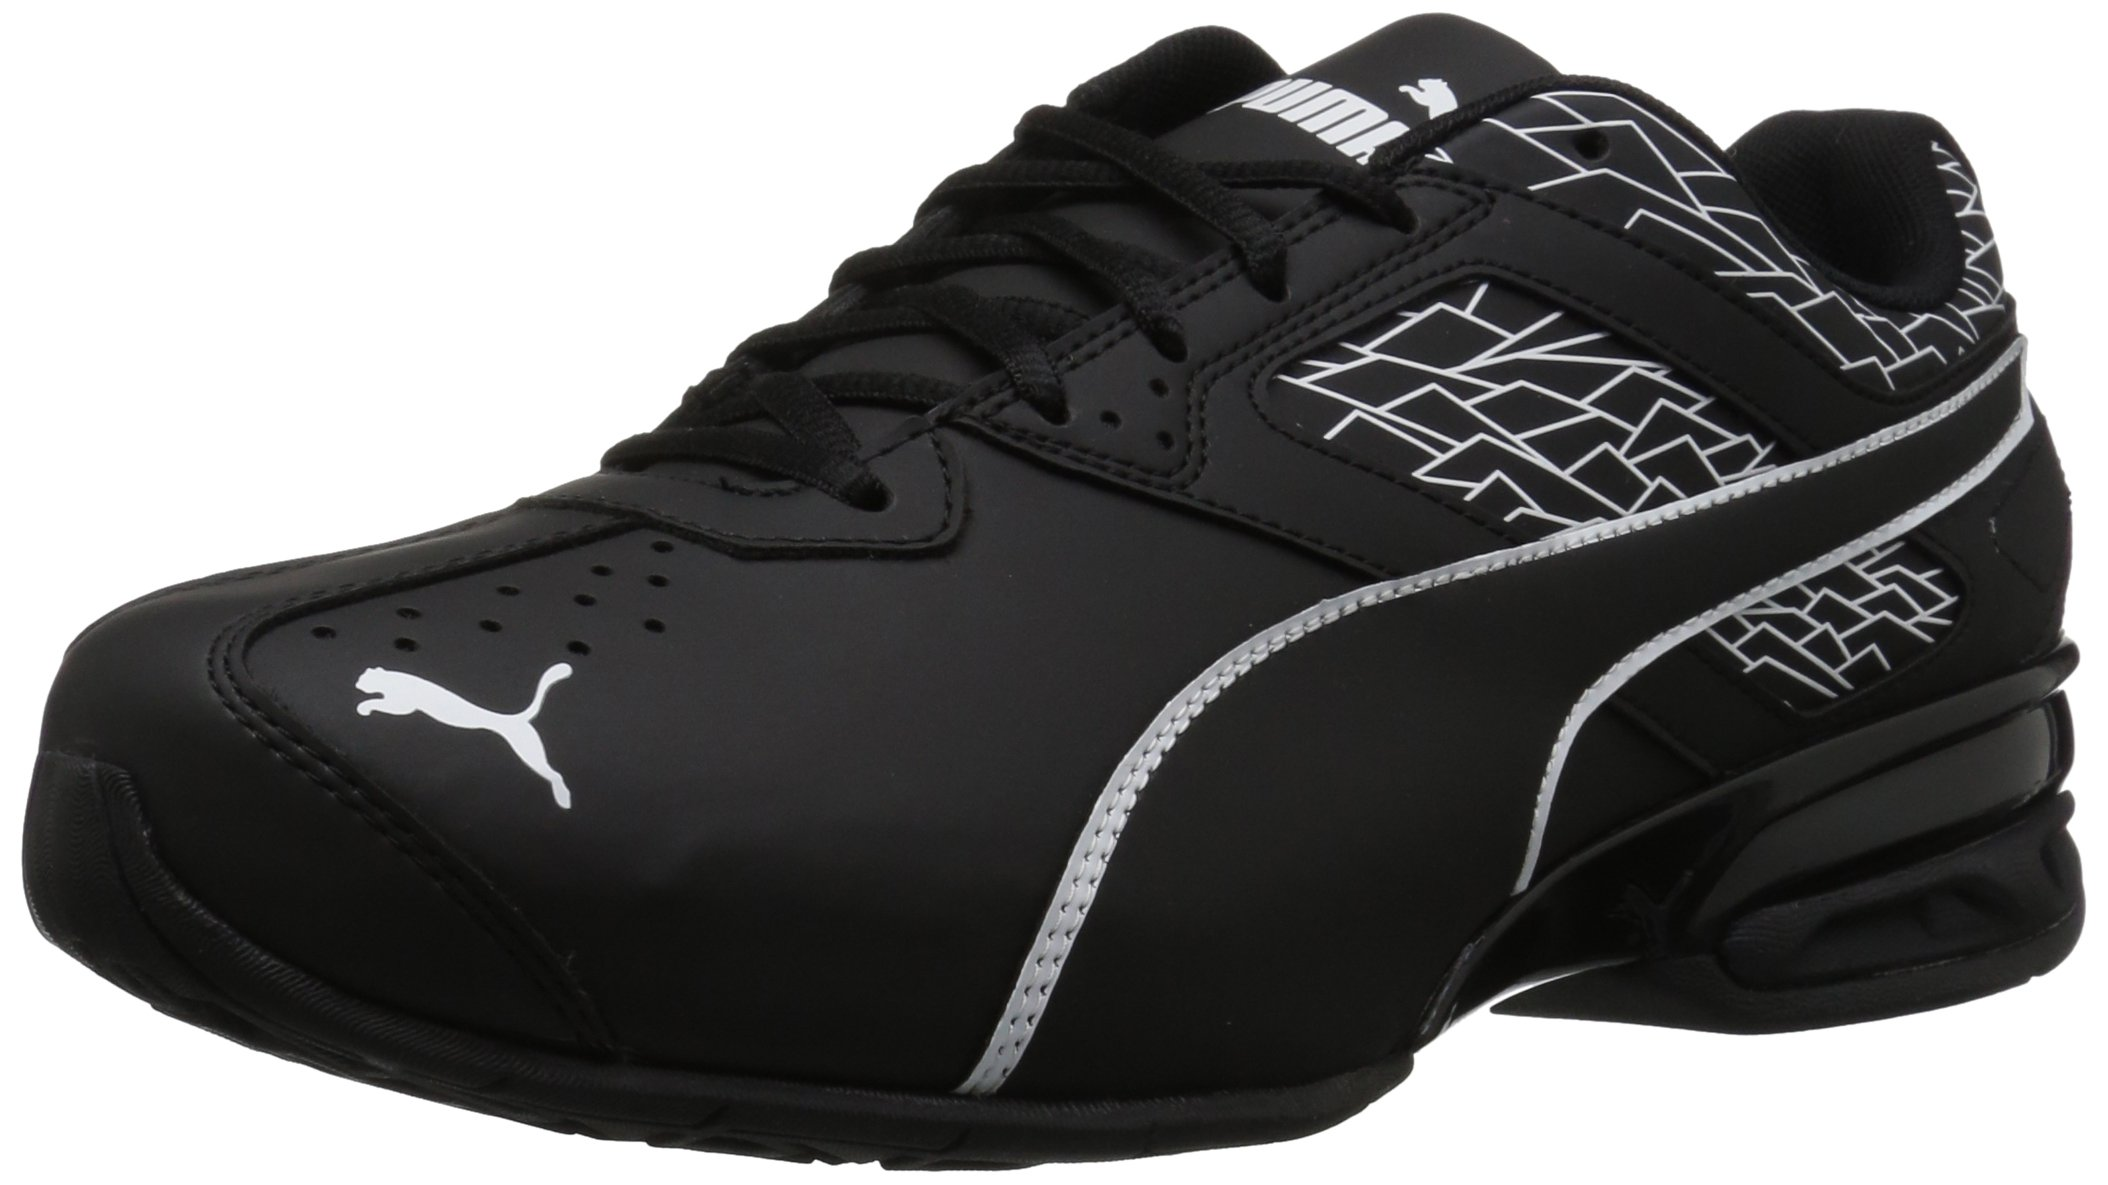 PUMA Men's Tazon 6 Wide Fracture FM Sneaker, Puma Black-Puma Black, 8.5 W US